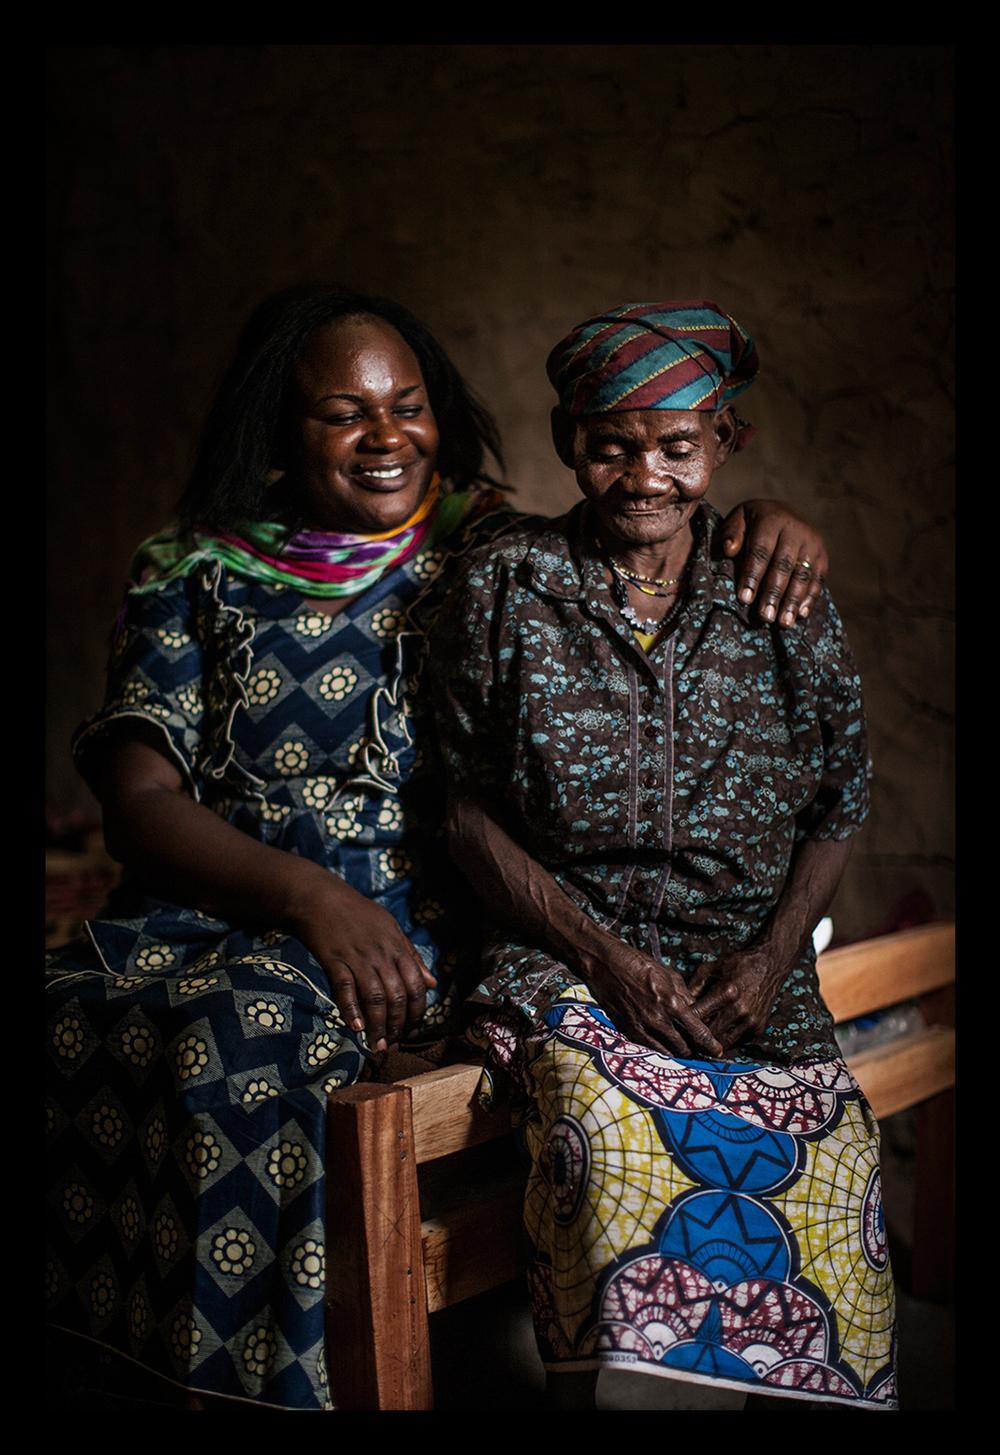 Kahindo Siherya Alphonsine poses with a Pygmy woman